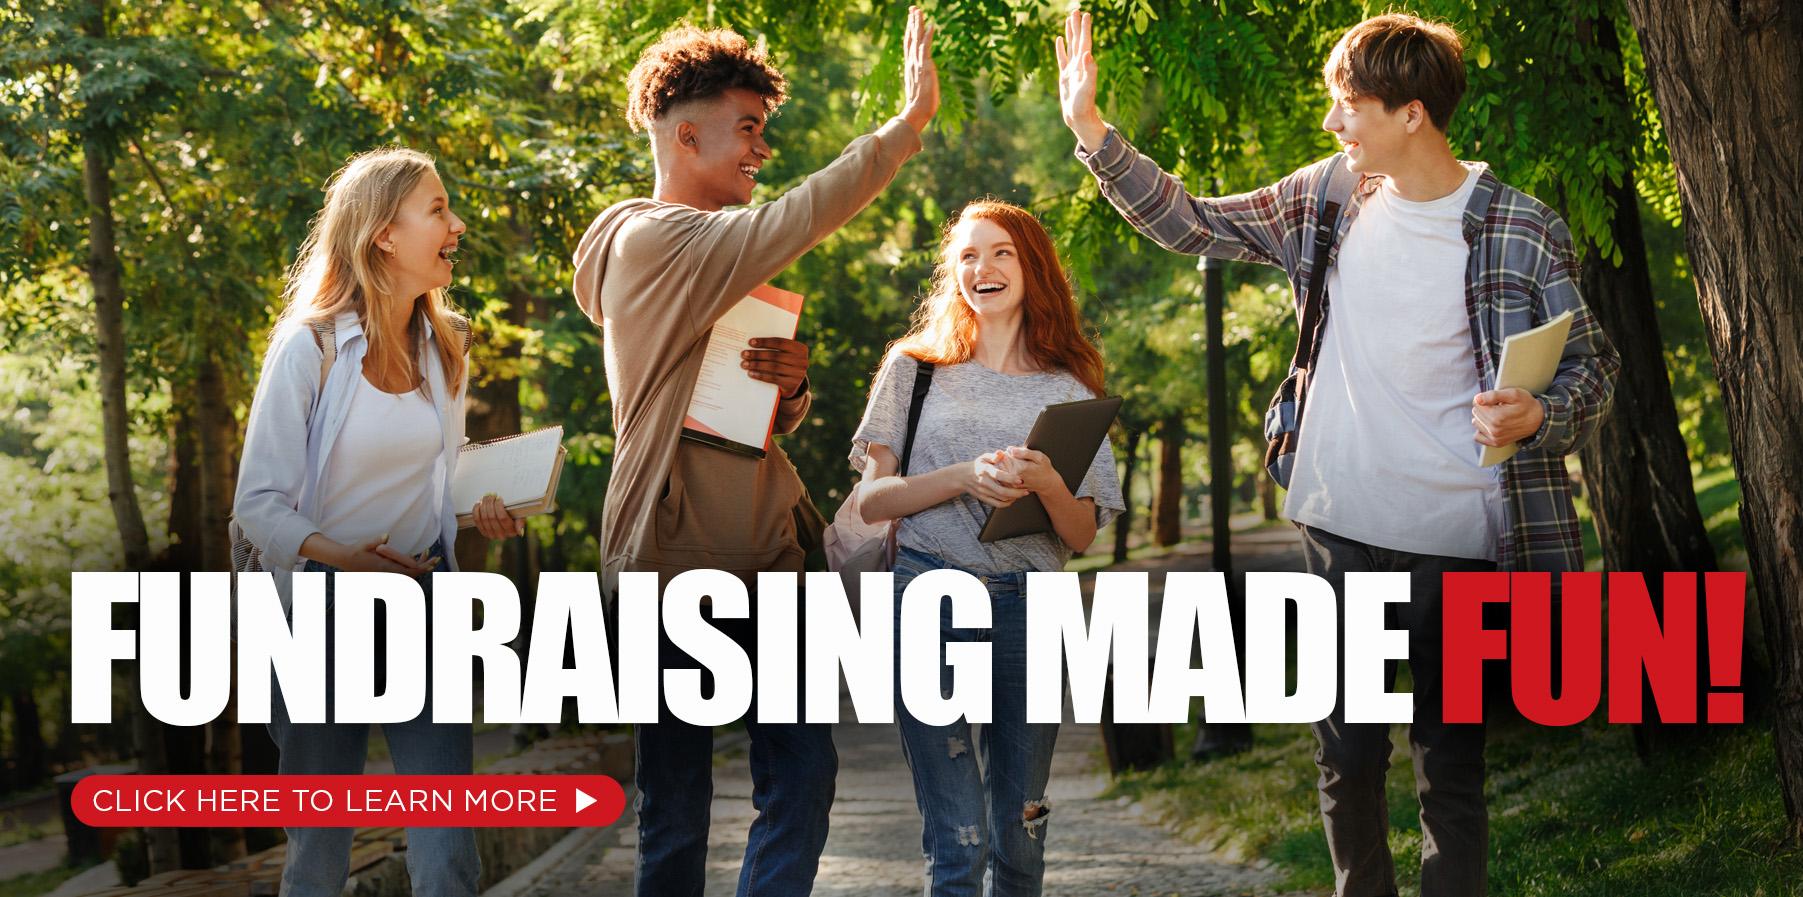 Fund raising made fun